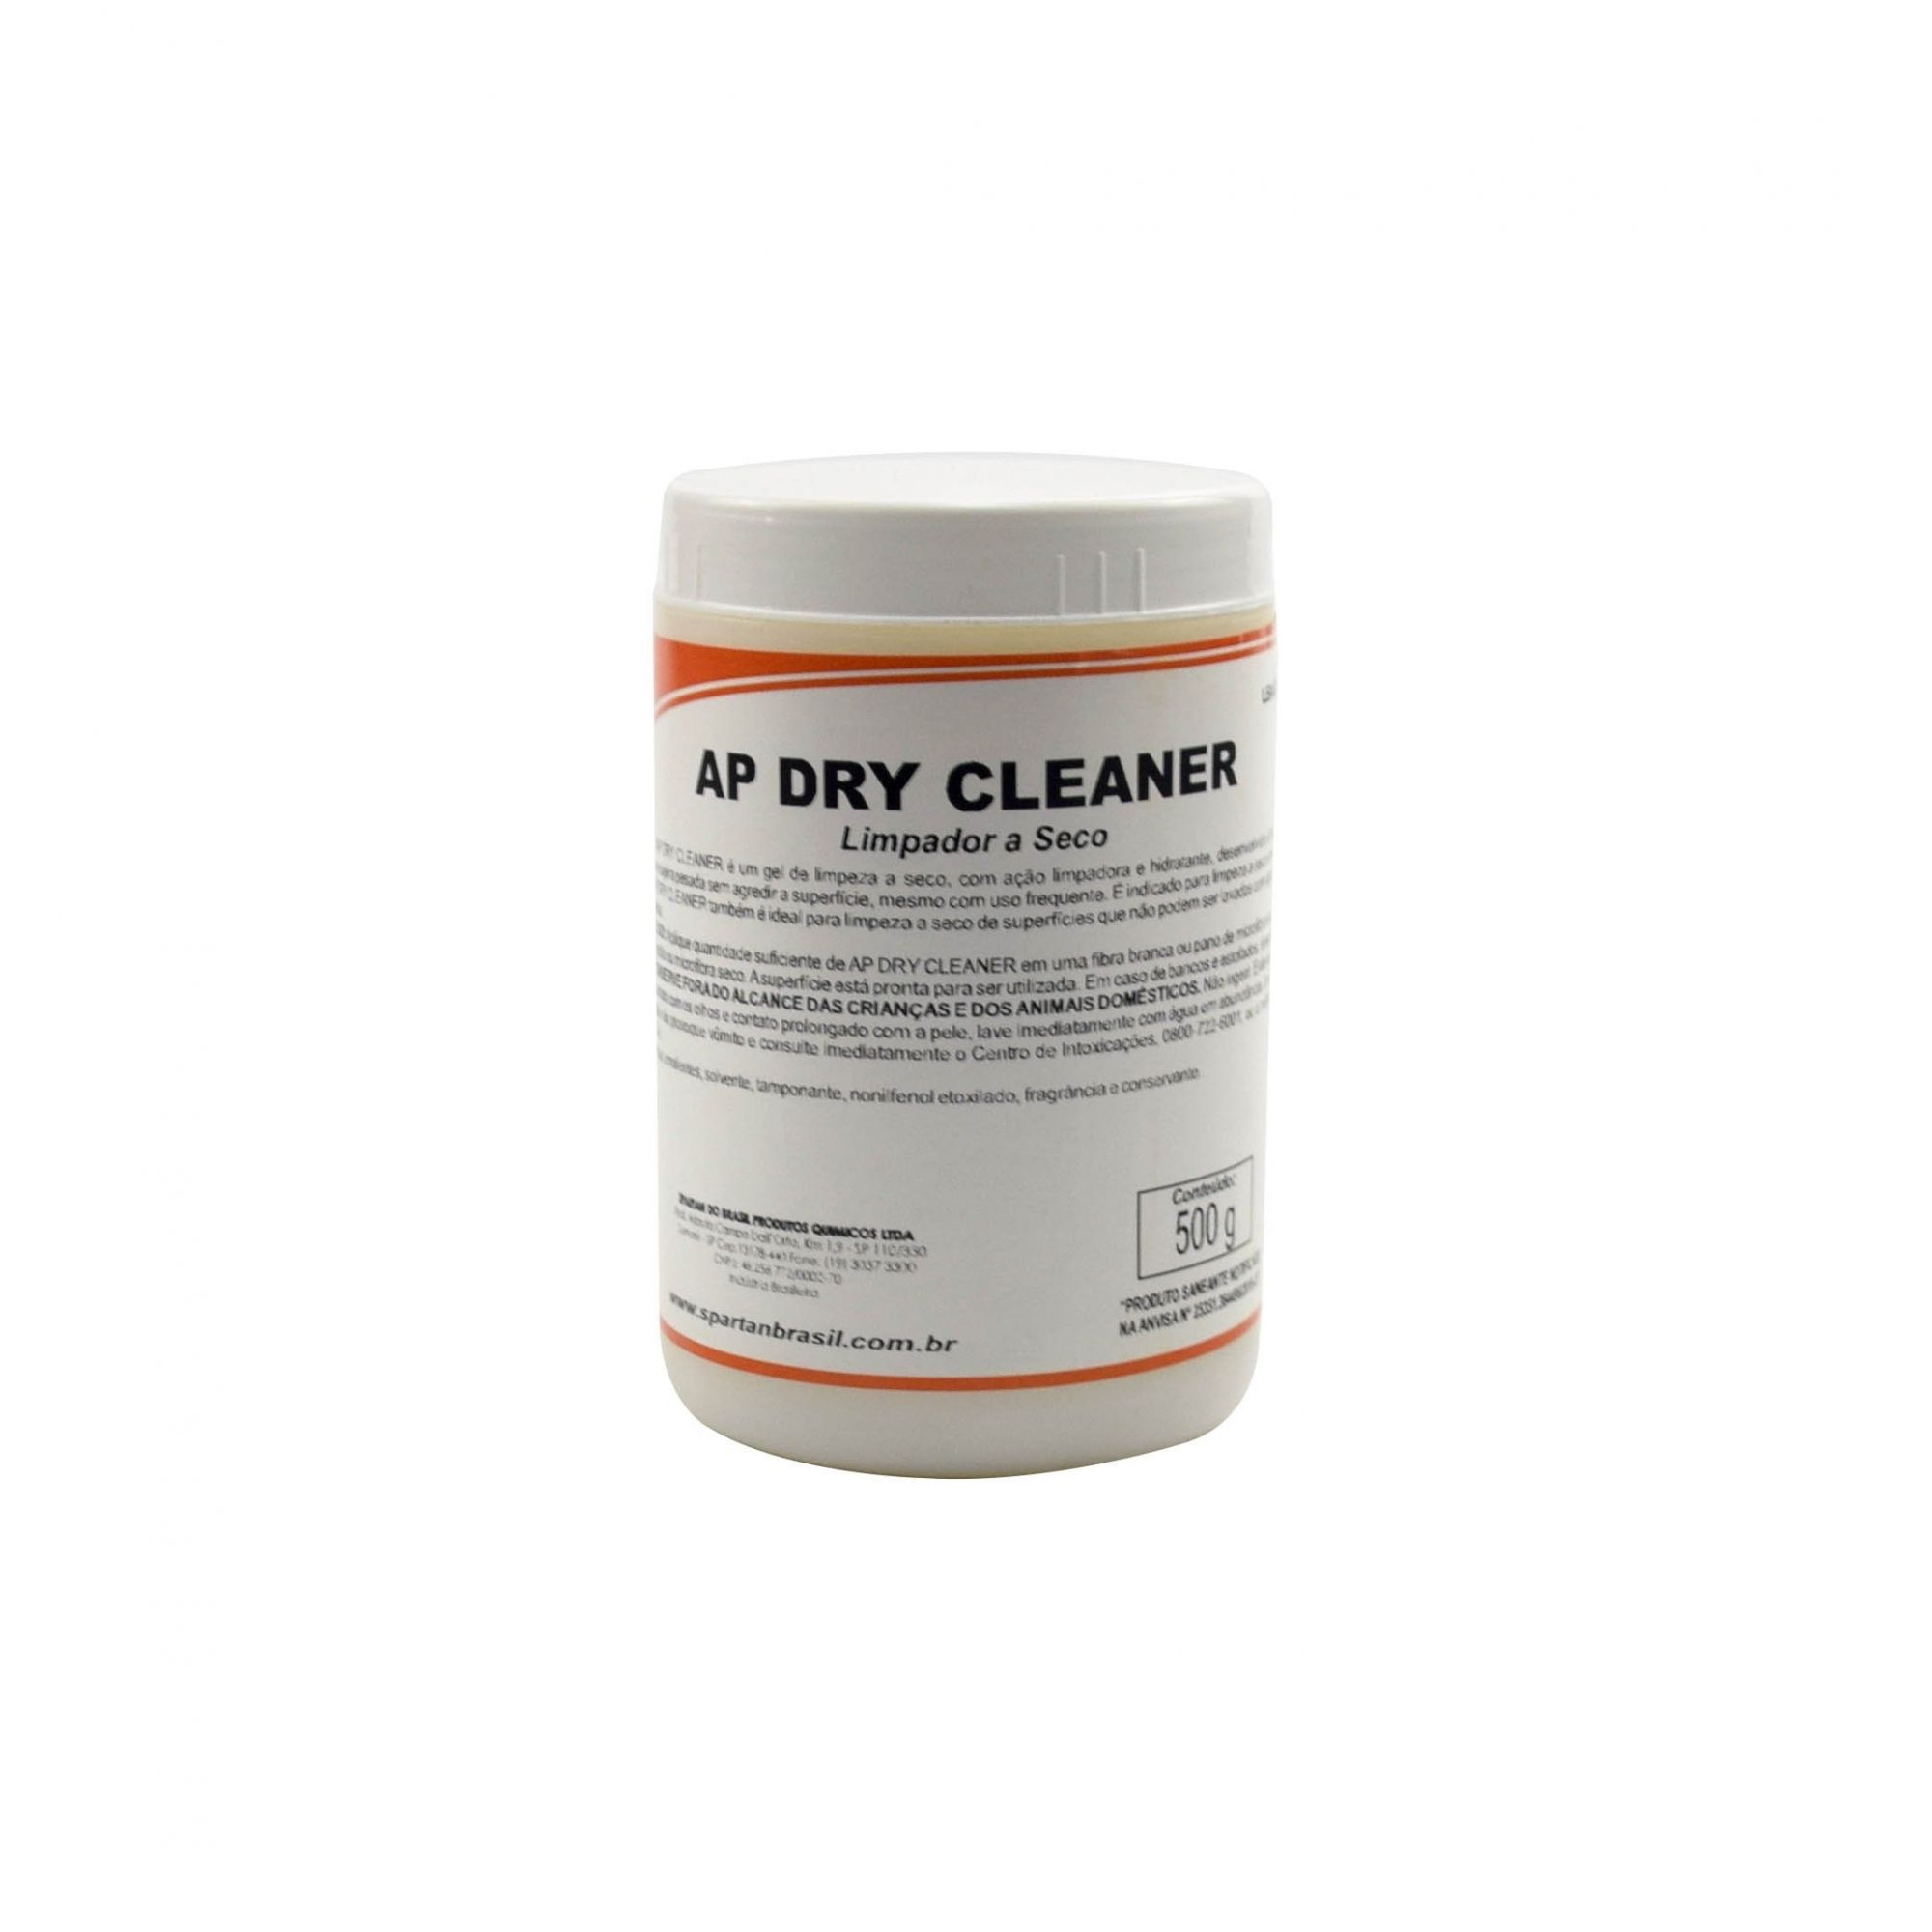 Gel Limpador de Couro a Seco Ap Dry Cleaner 500g - Spartan  - COLAR